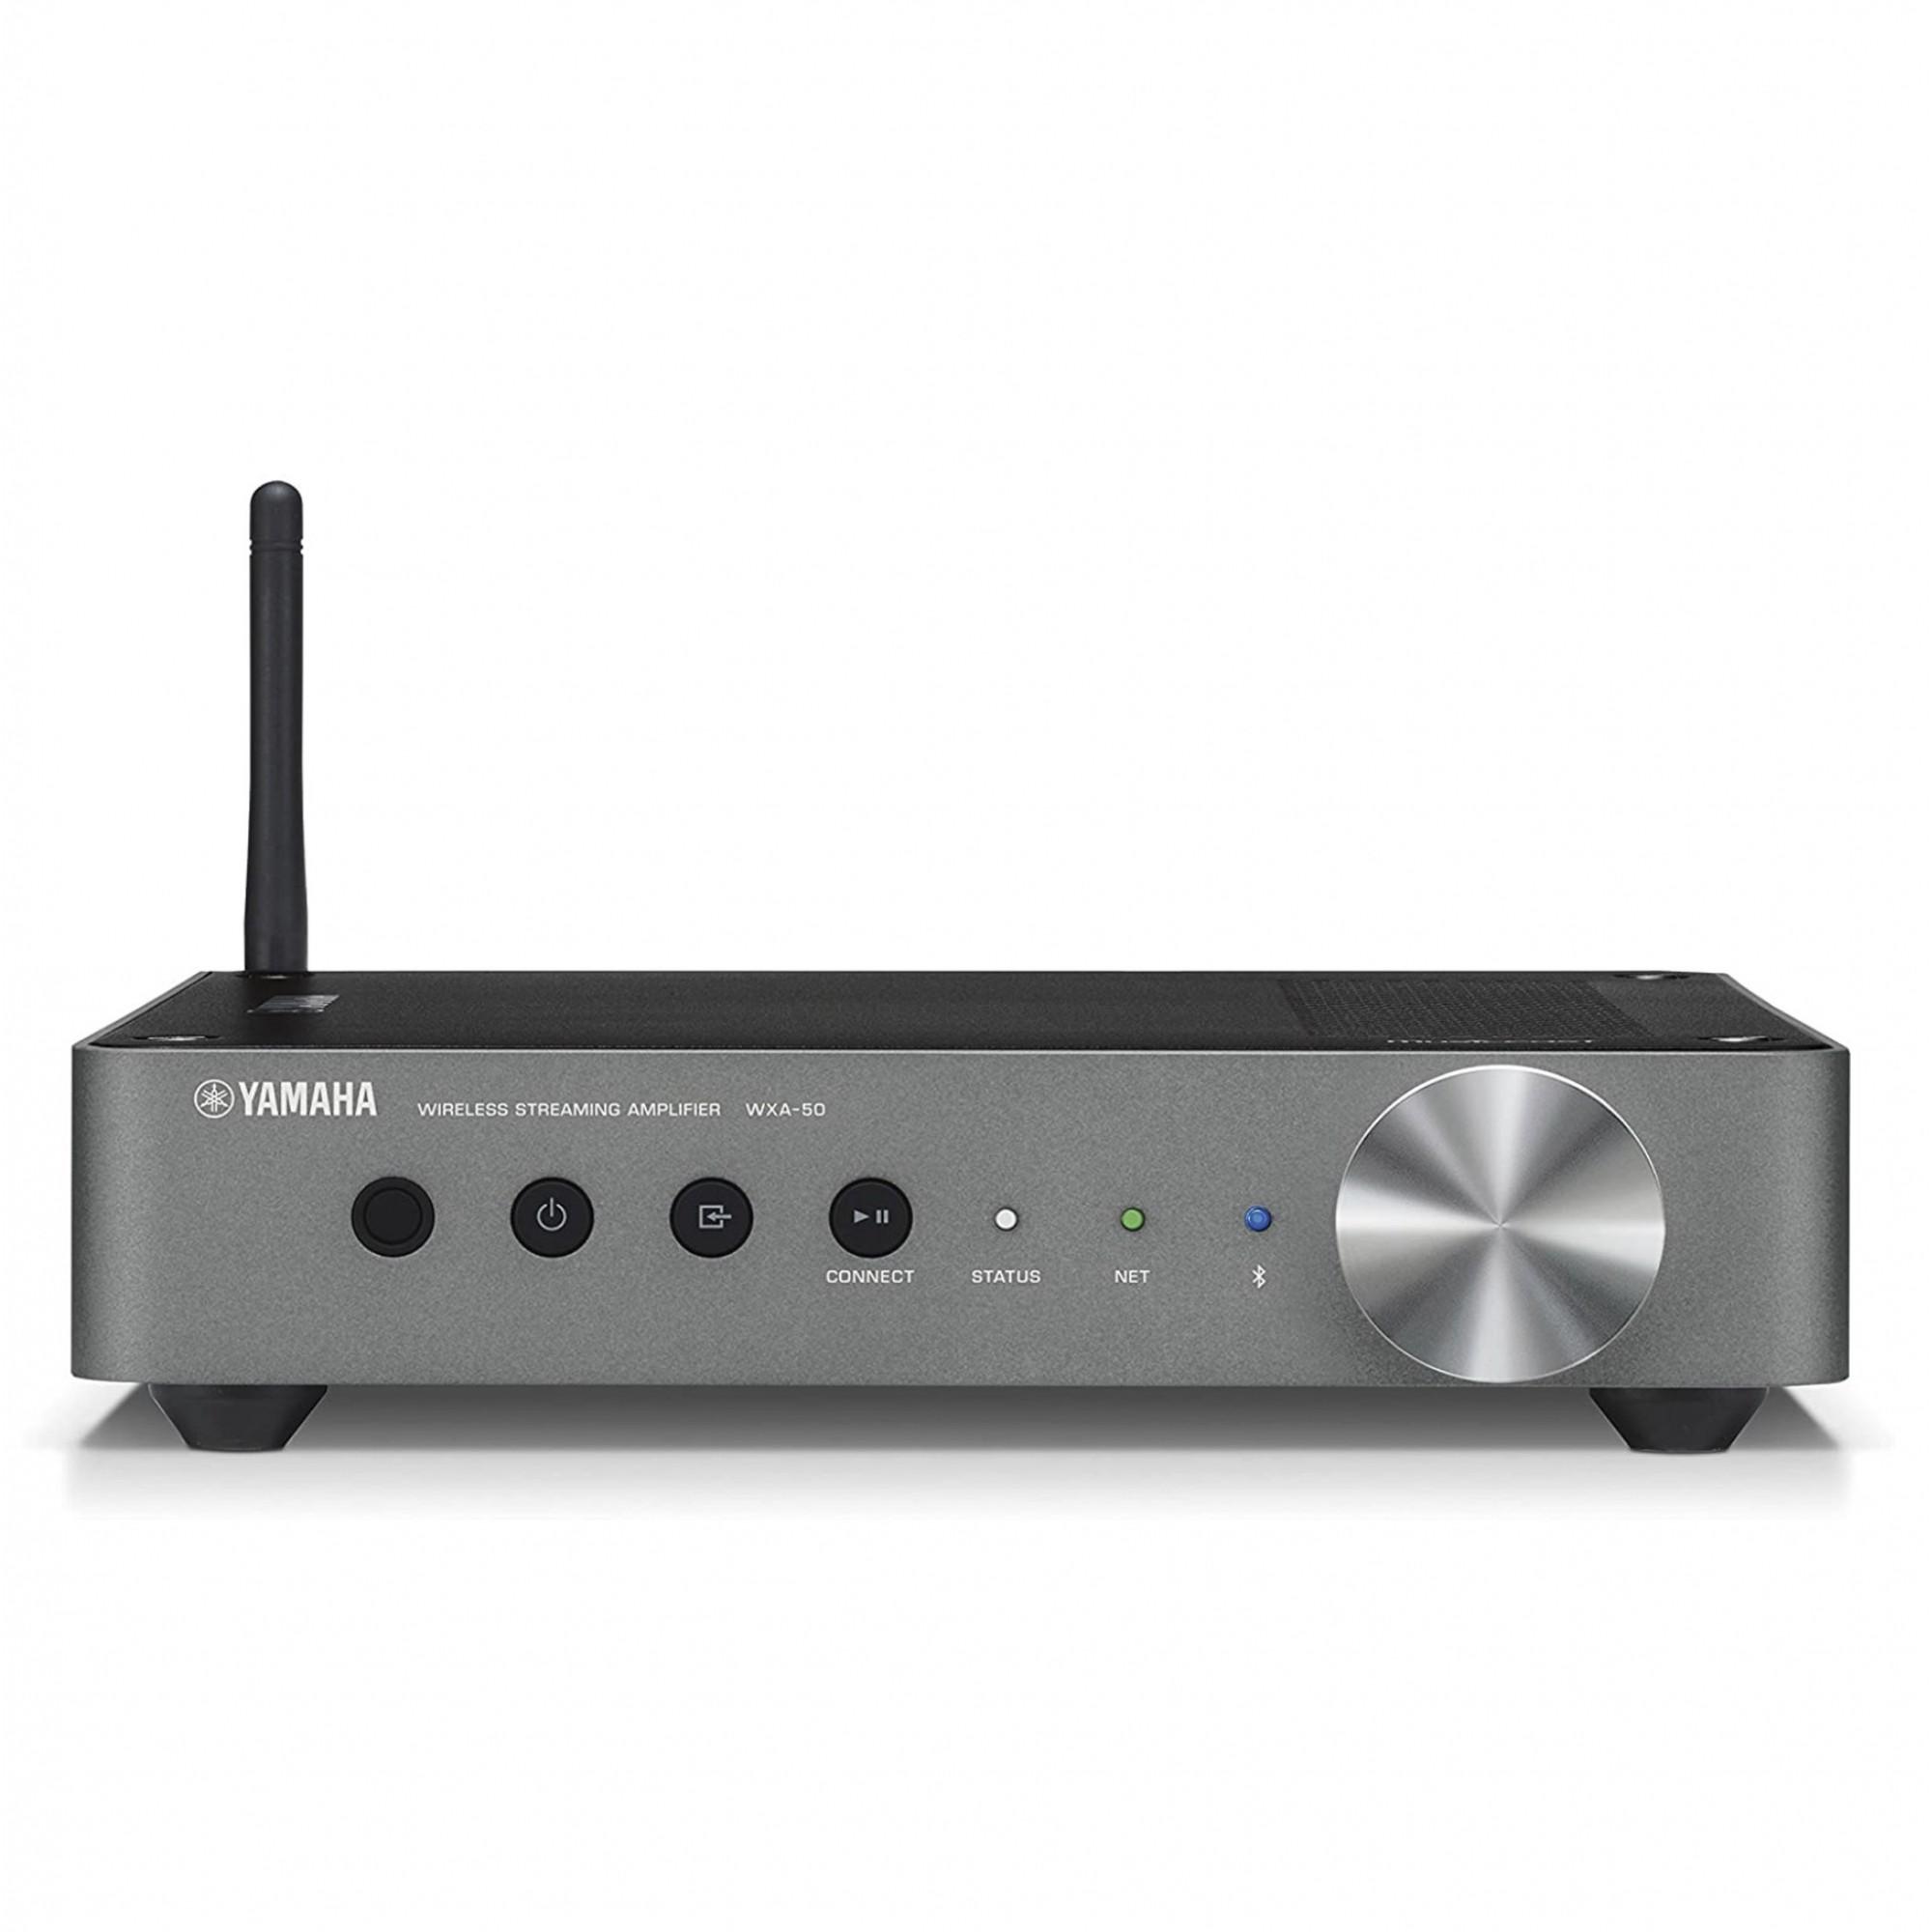 Amplificador Yamaha Wxa-50 Wi-fi Airplay Bluetooth 110v